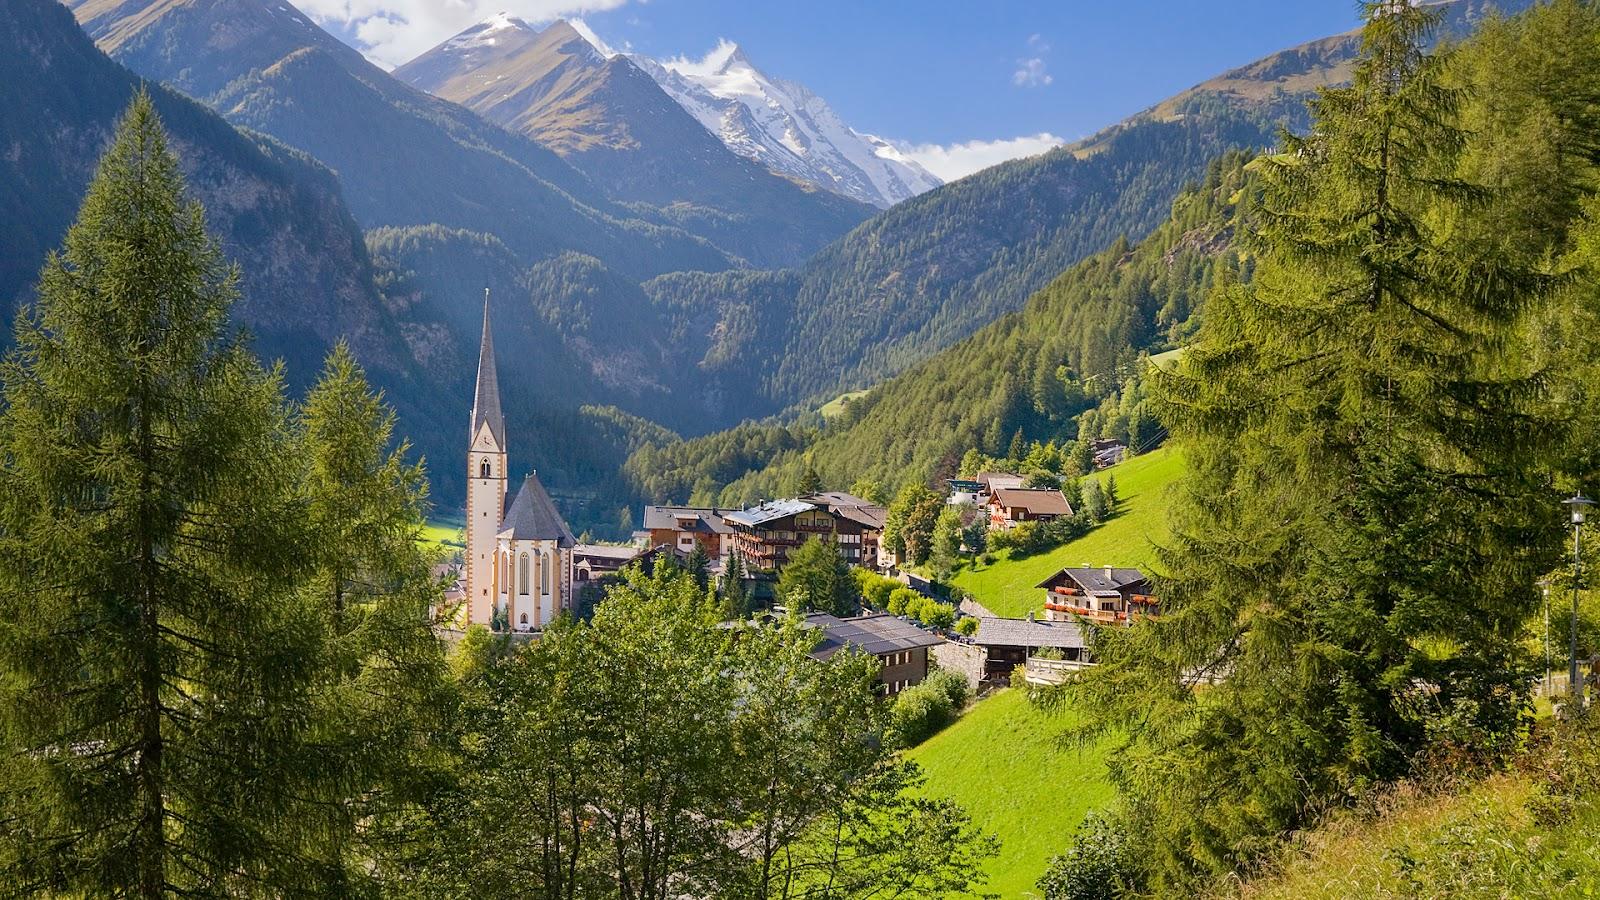 http://1.bp.blogspot.com/-oosNaUGiTpM/UAfD5cUNo_I/AAAAAAAADH8/izO-4zei2kk/s1600/Heiligenblut+Village%252C+Austria.jpg